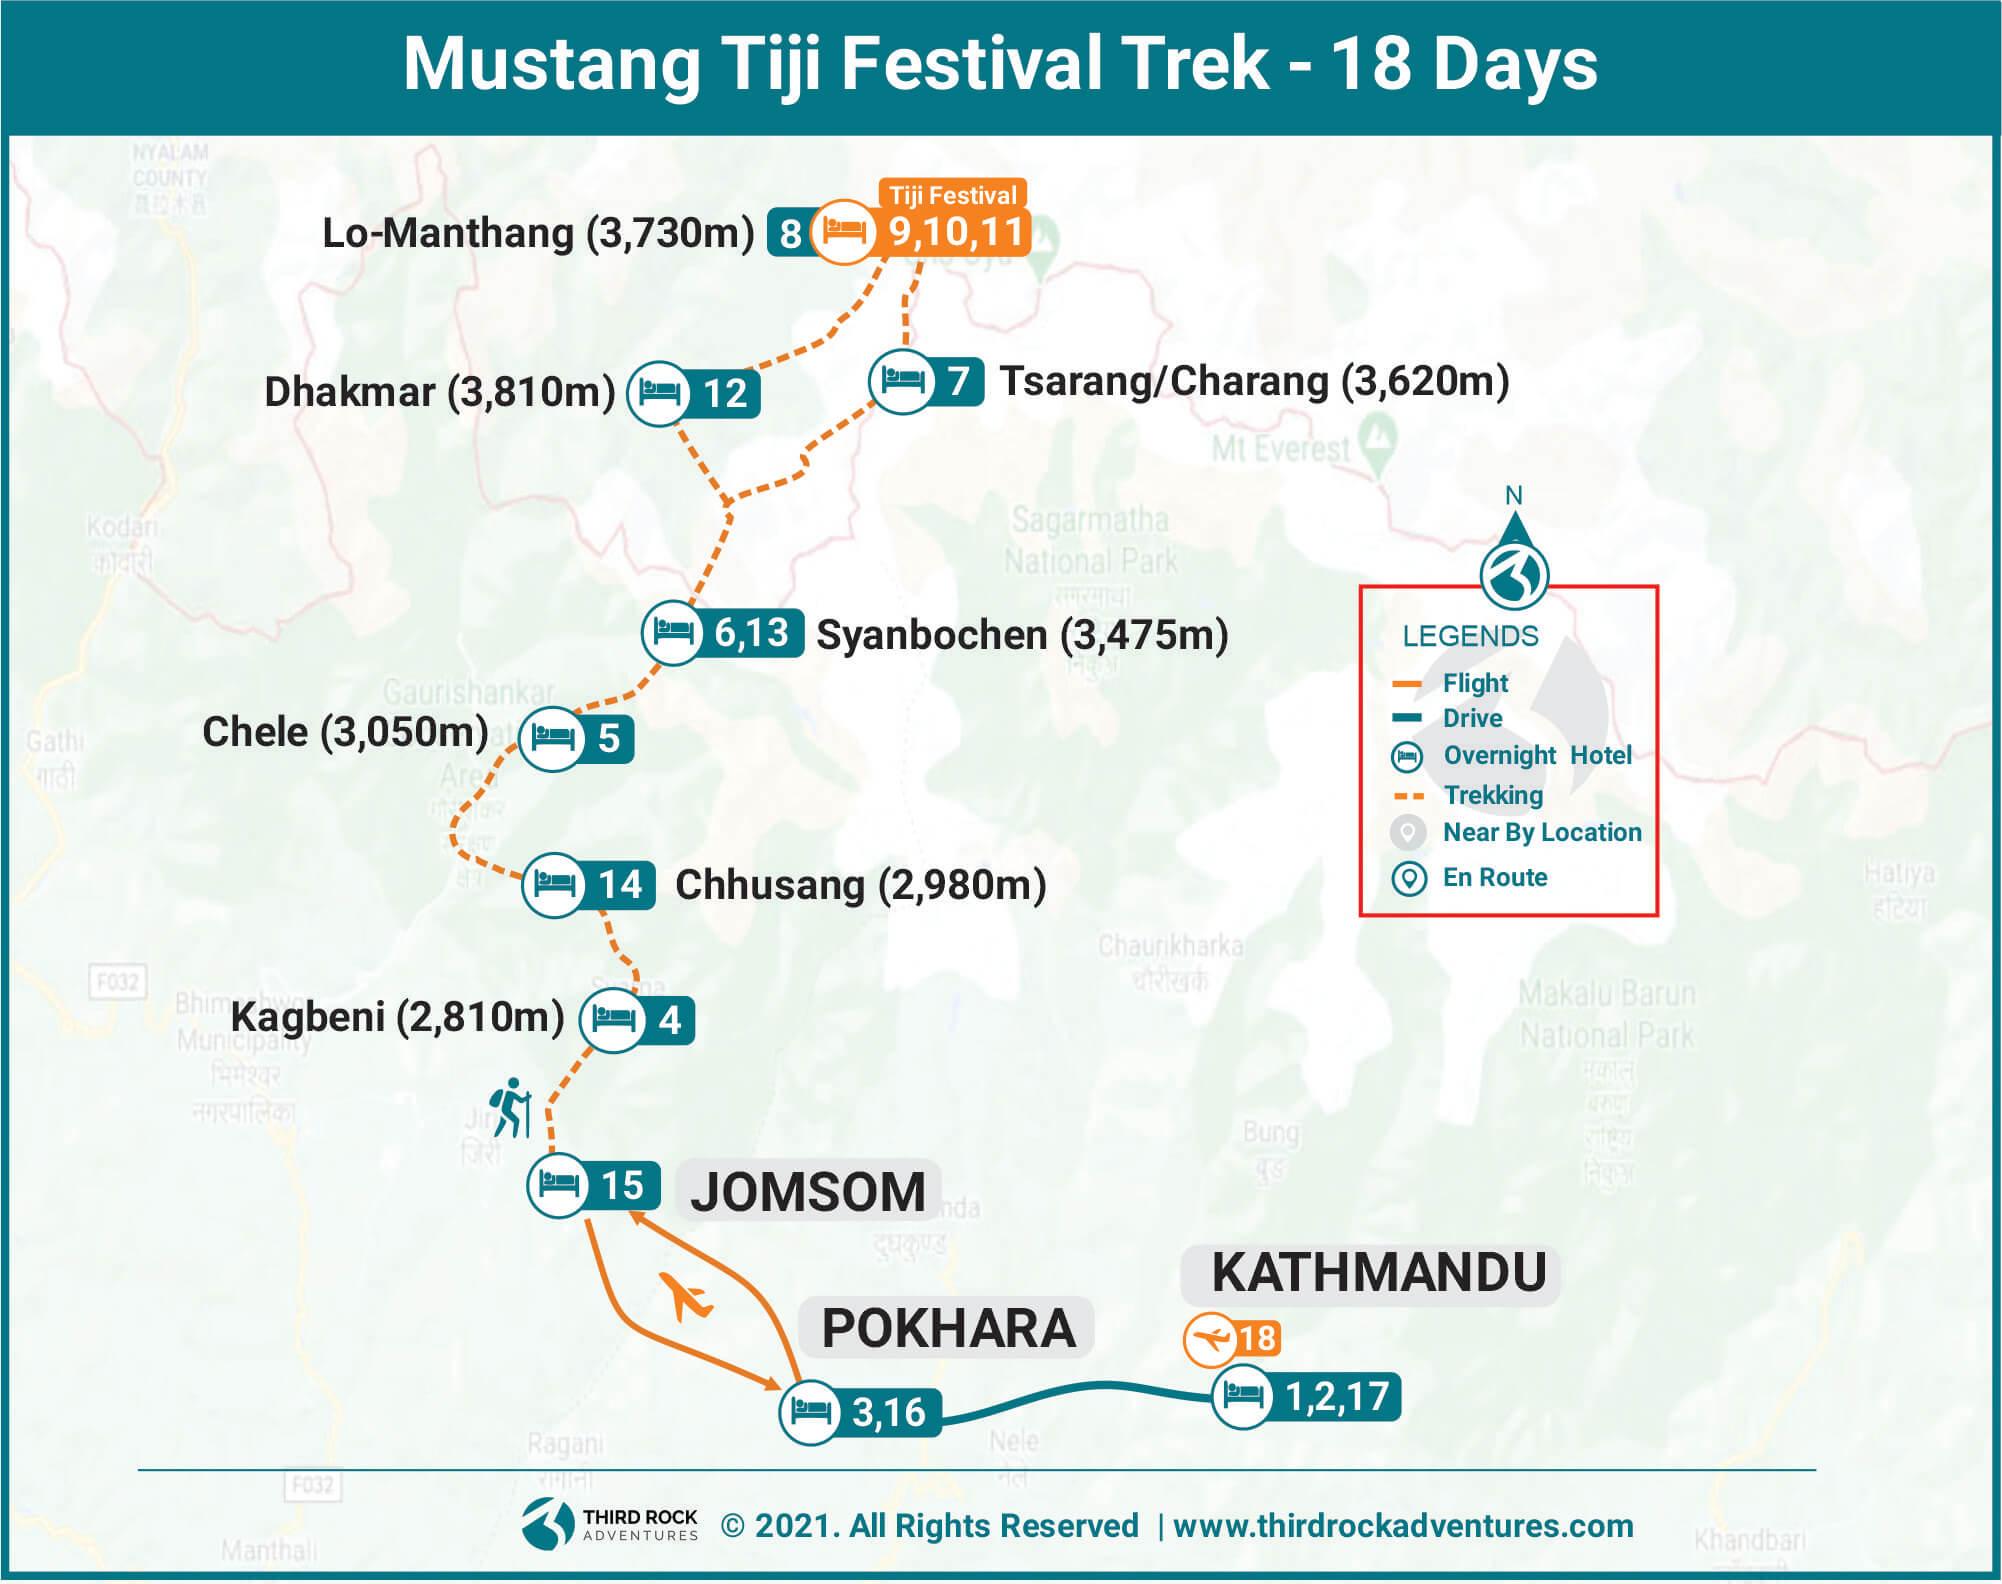 Mustang Tiji Festival Trek Route Map